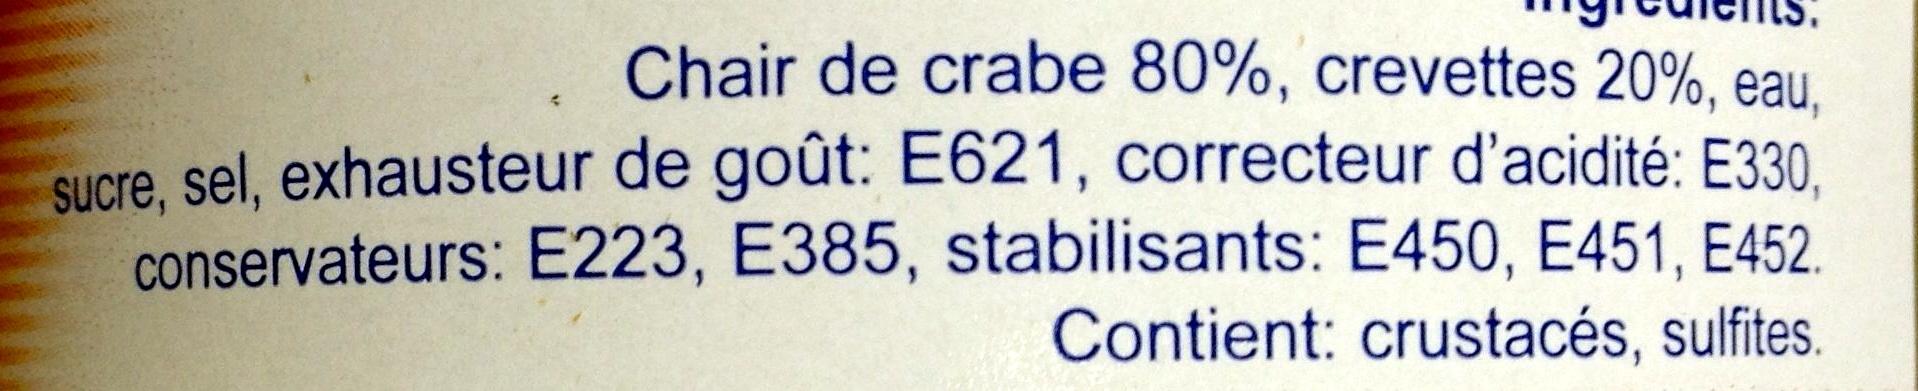 Duo crabe et crevette - Ingredients - fr